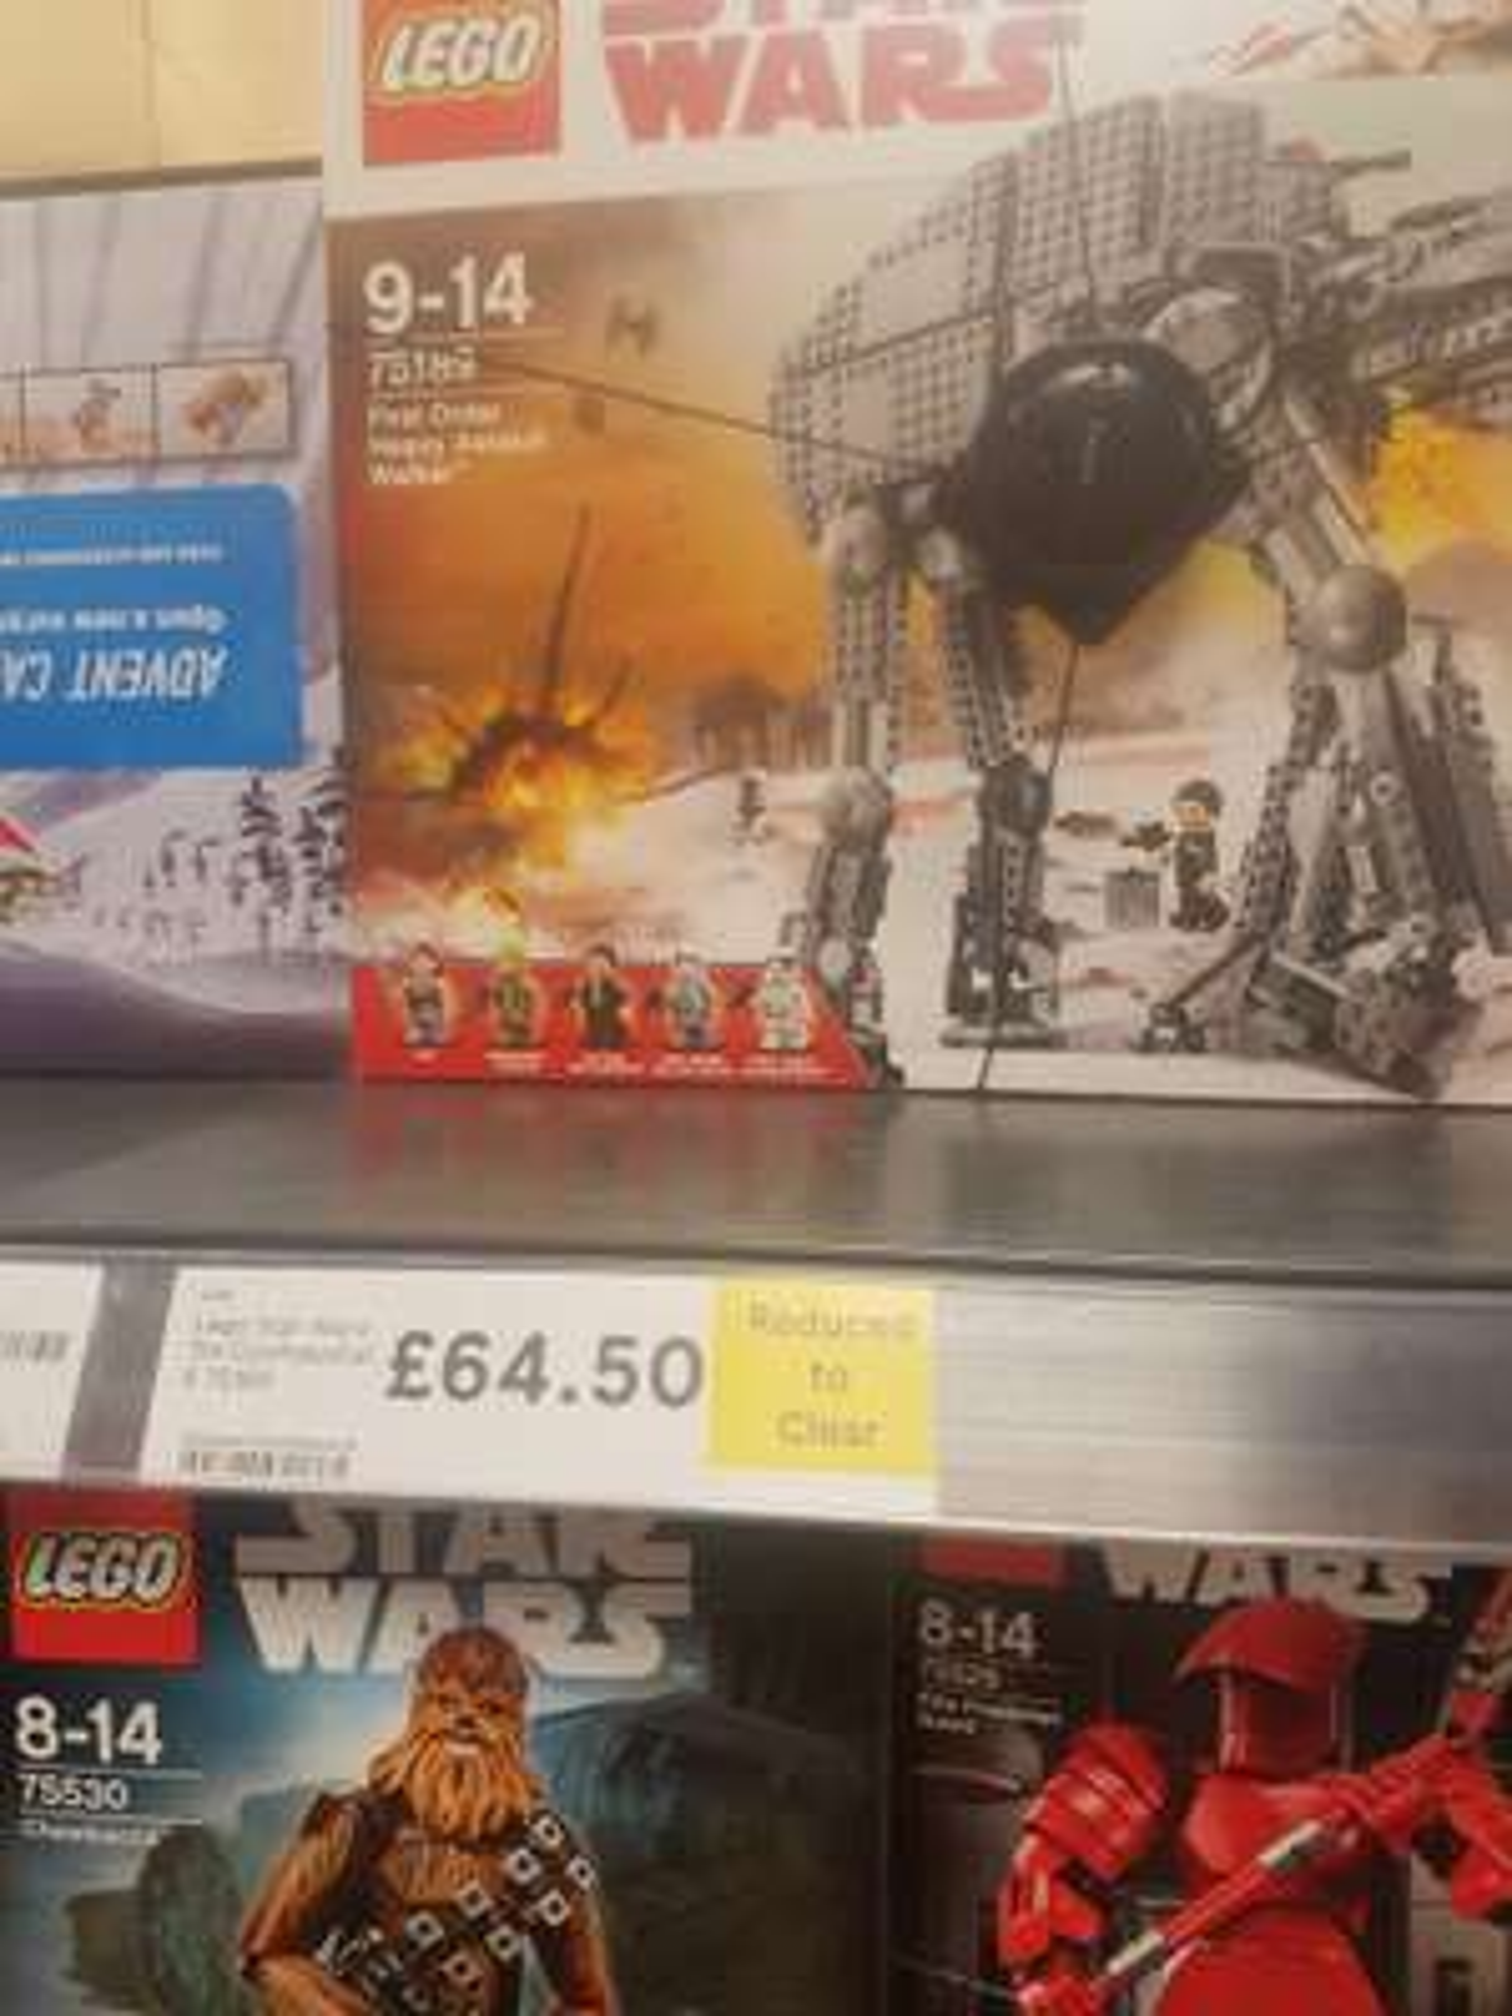 LEGO 75189 First Order Heavy Assault Walker £64.50 in Tesco (Gloucester)